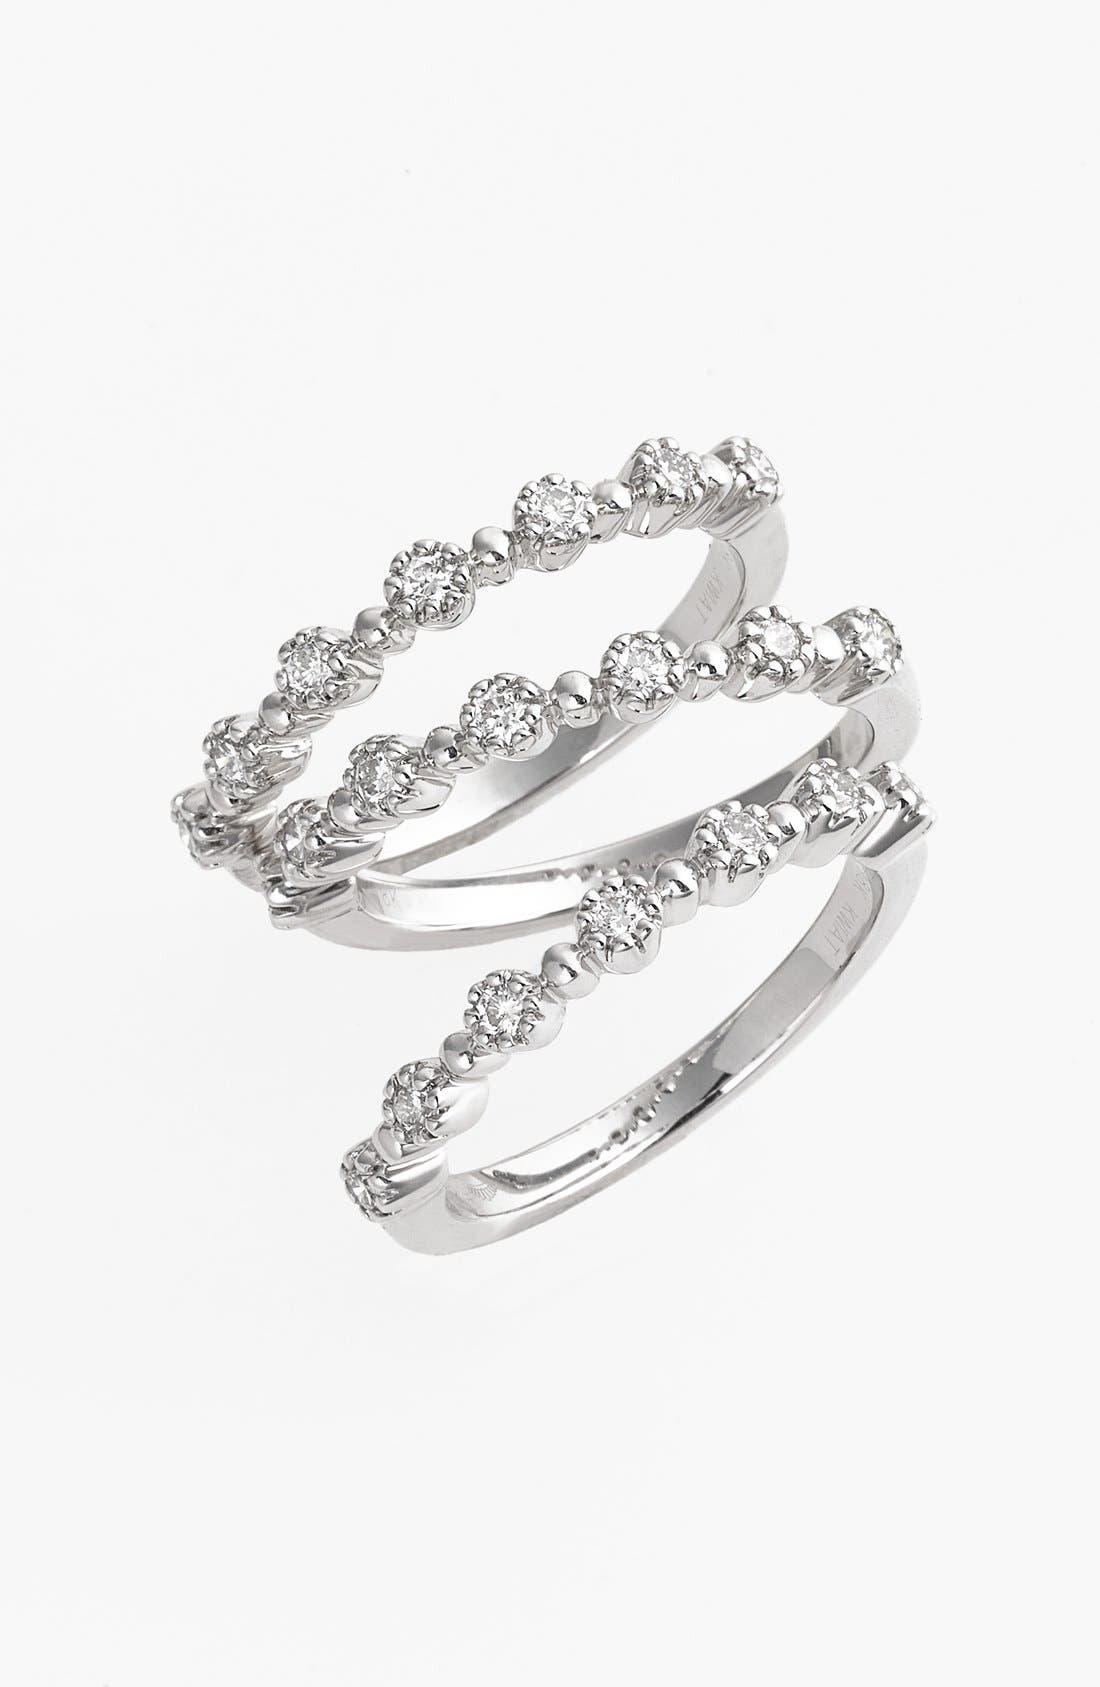 Alternate Image 1 Selected - Kwiat 'Stardust' Diamond Stackable Rings (Set of 3)